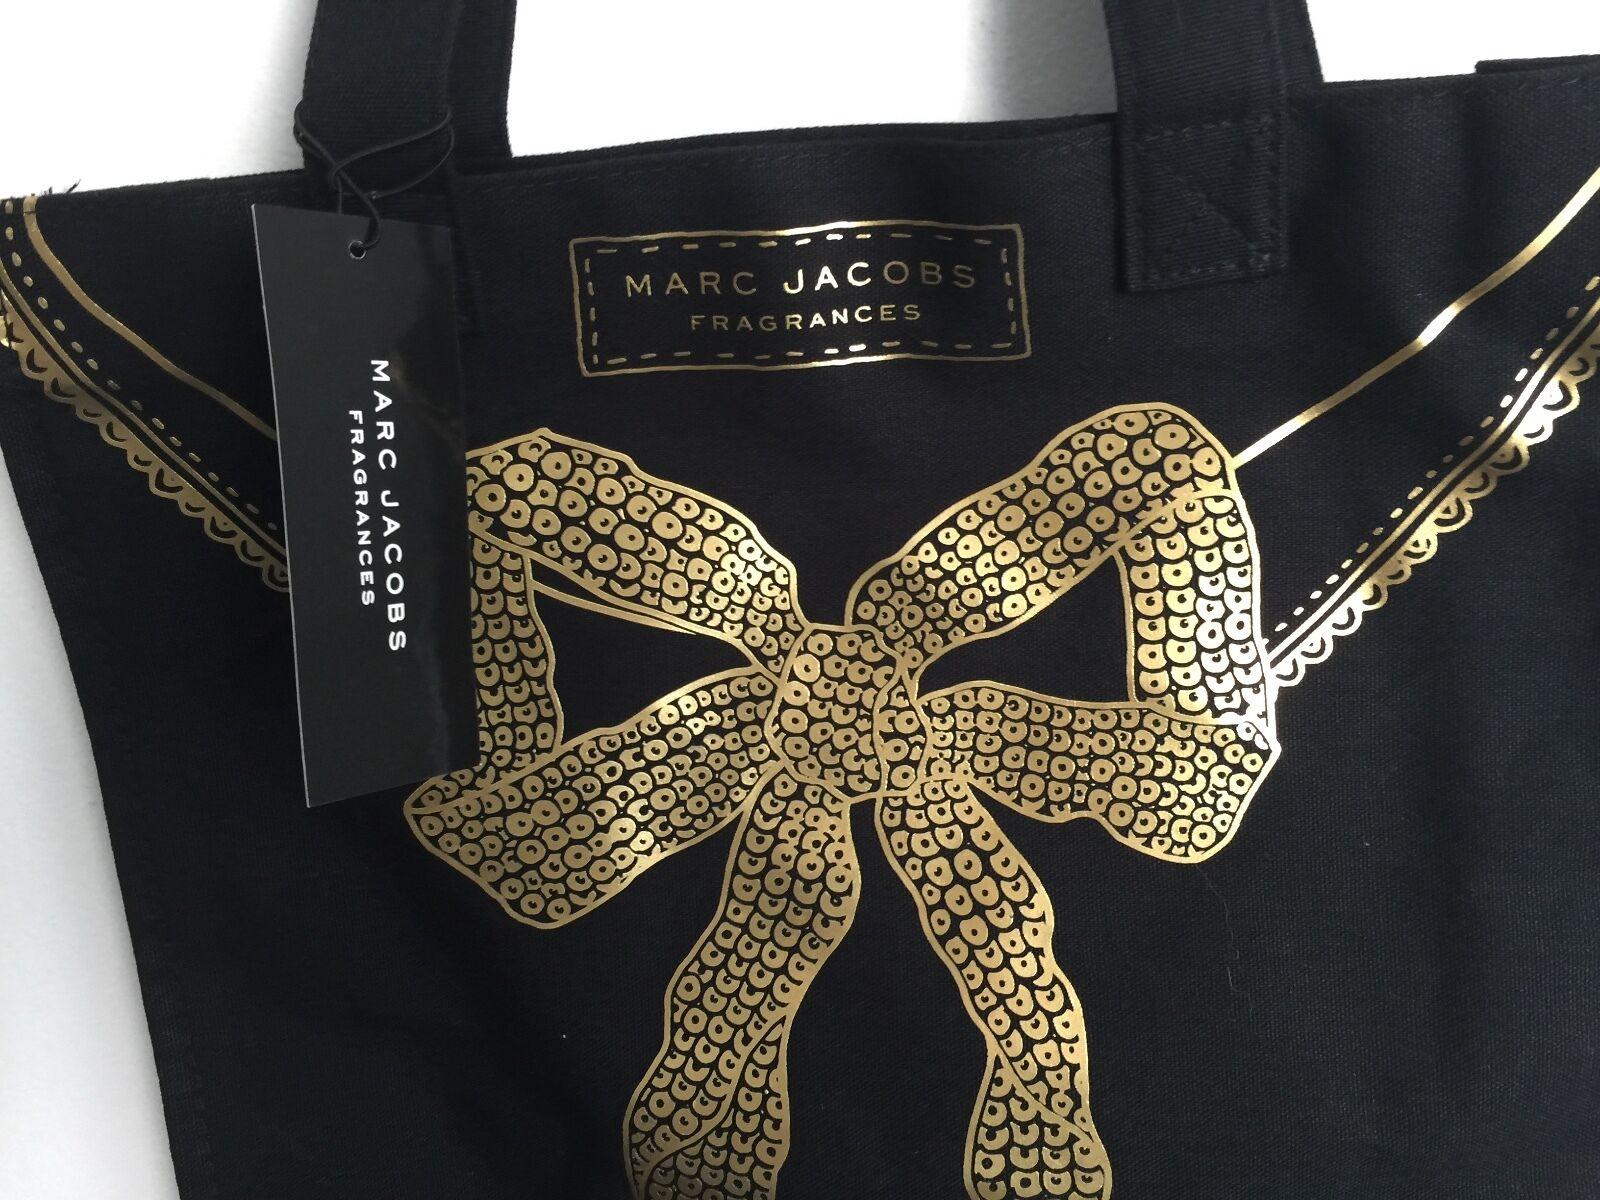 3c1a8f5618 Marc Jacobs Fragrances Women Tote Bag Black Canvas Gold Bow Handbag ...